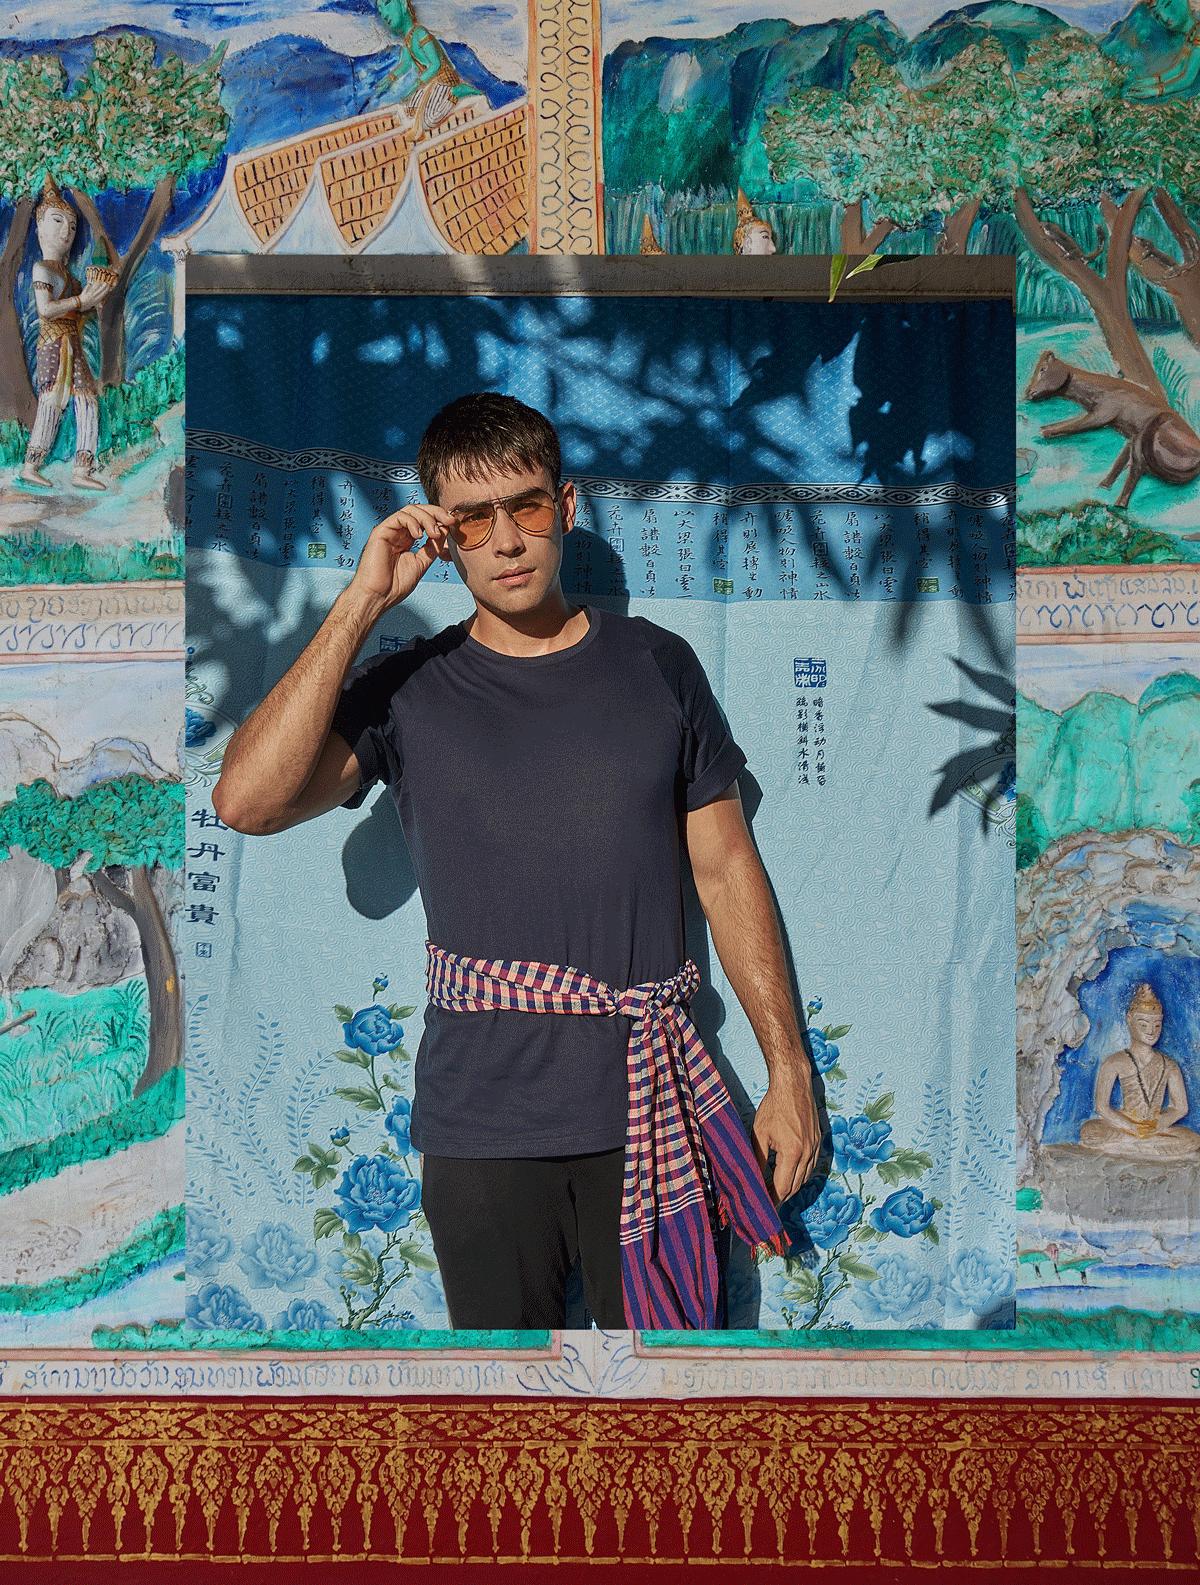 Tshirt : SARIT / pants : gingko / sunglasses : Tavat eyewear